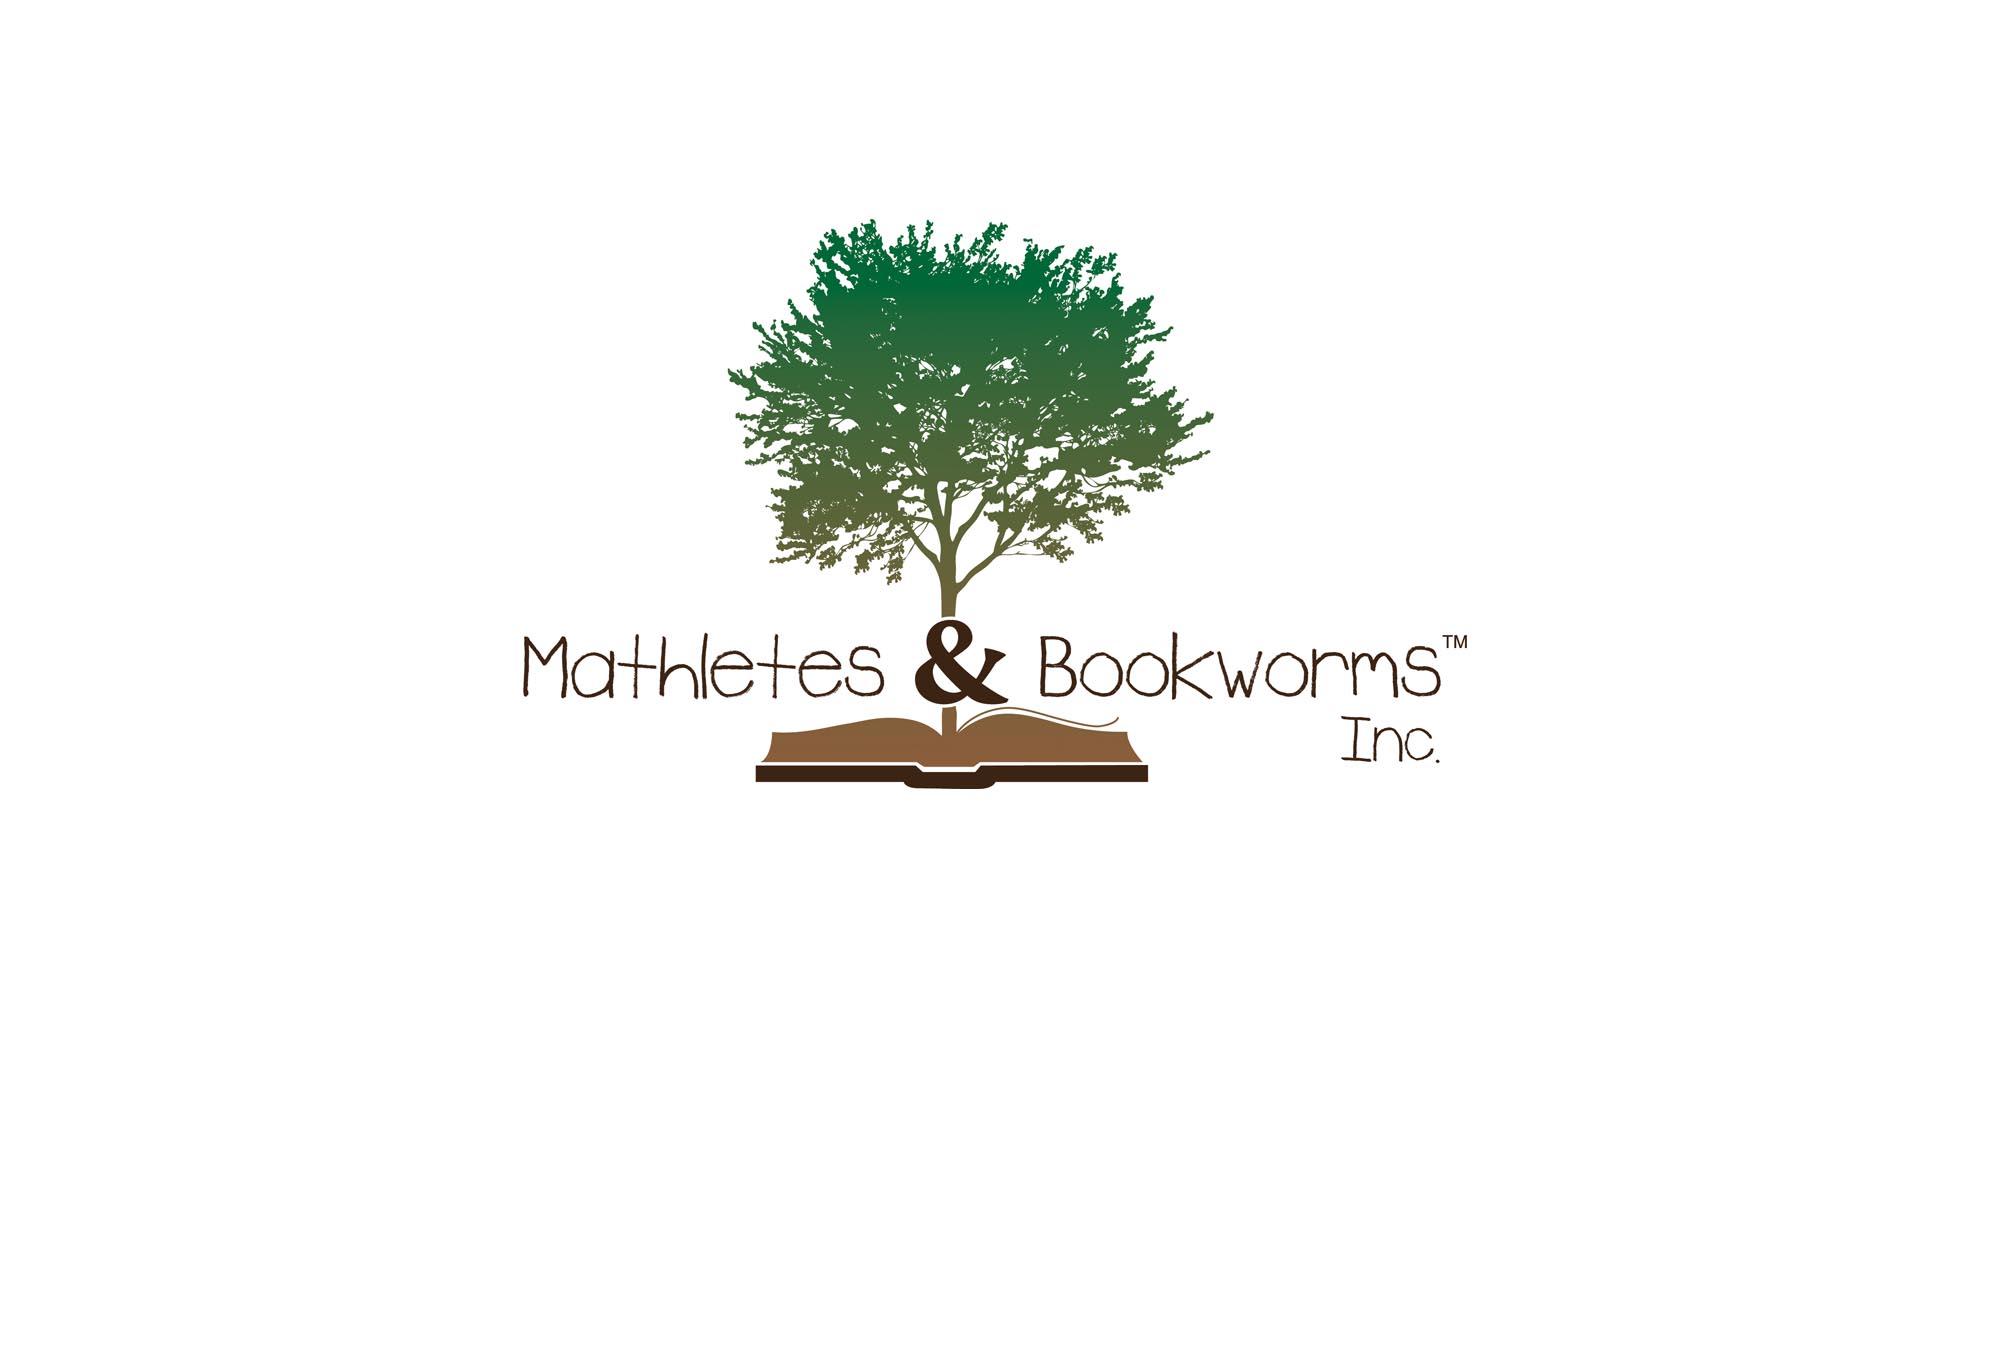 Mathletes & Bookworms